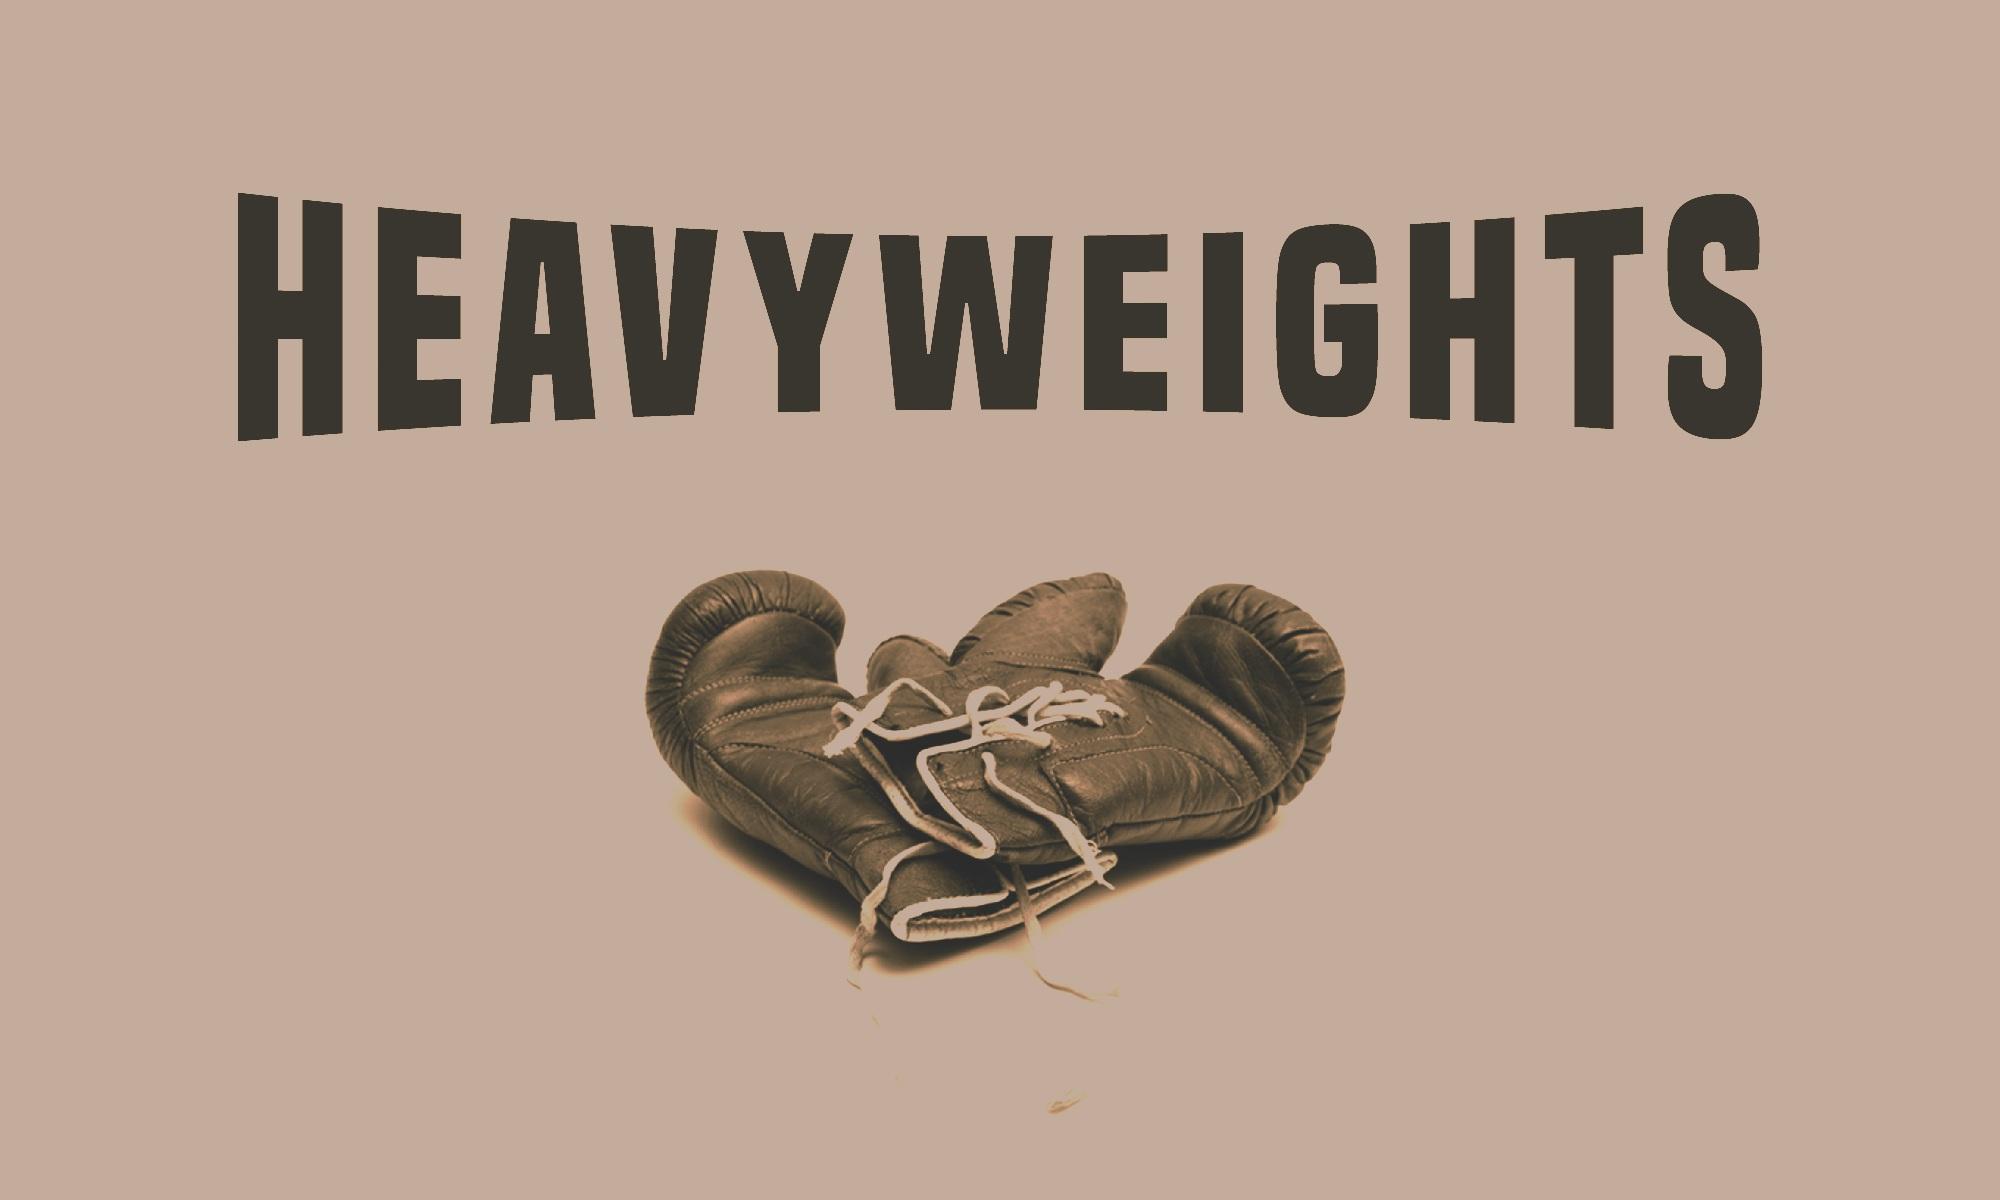 HEAVYWEIGHTS | WEEK 2 - 3.24.19 | Phillip Martin